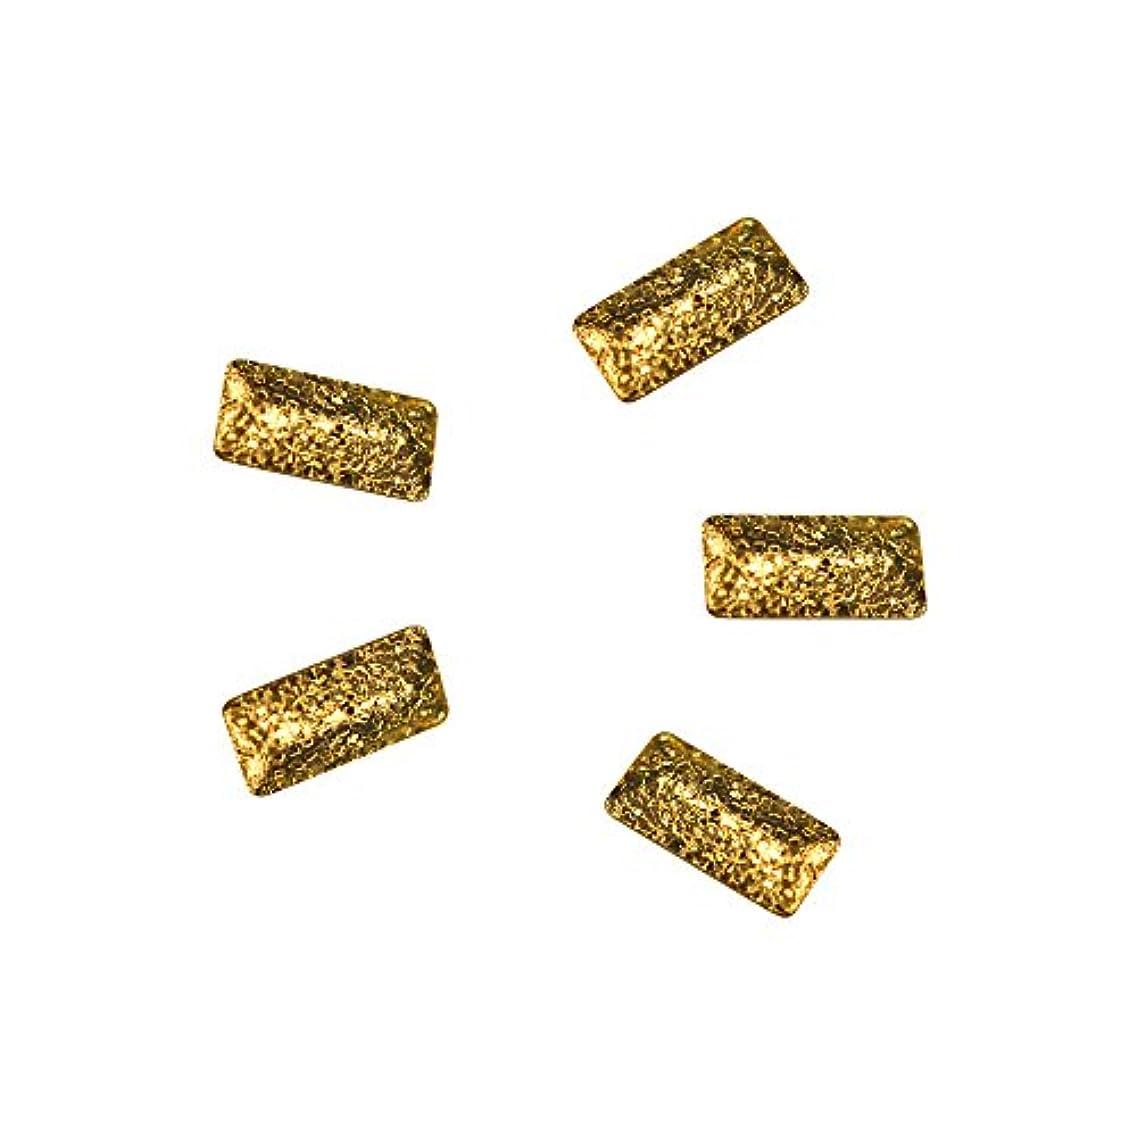 Bonnail ラフスタッズゴールド レクタングル 3×1.2mm 30P